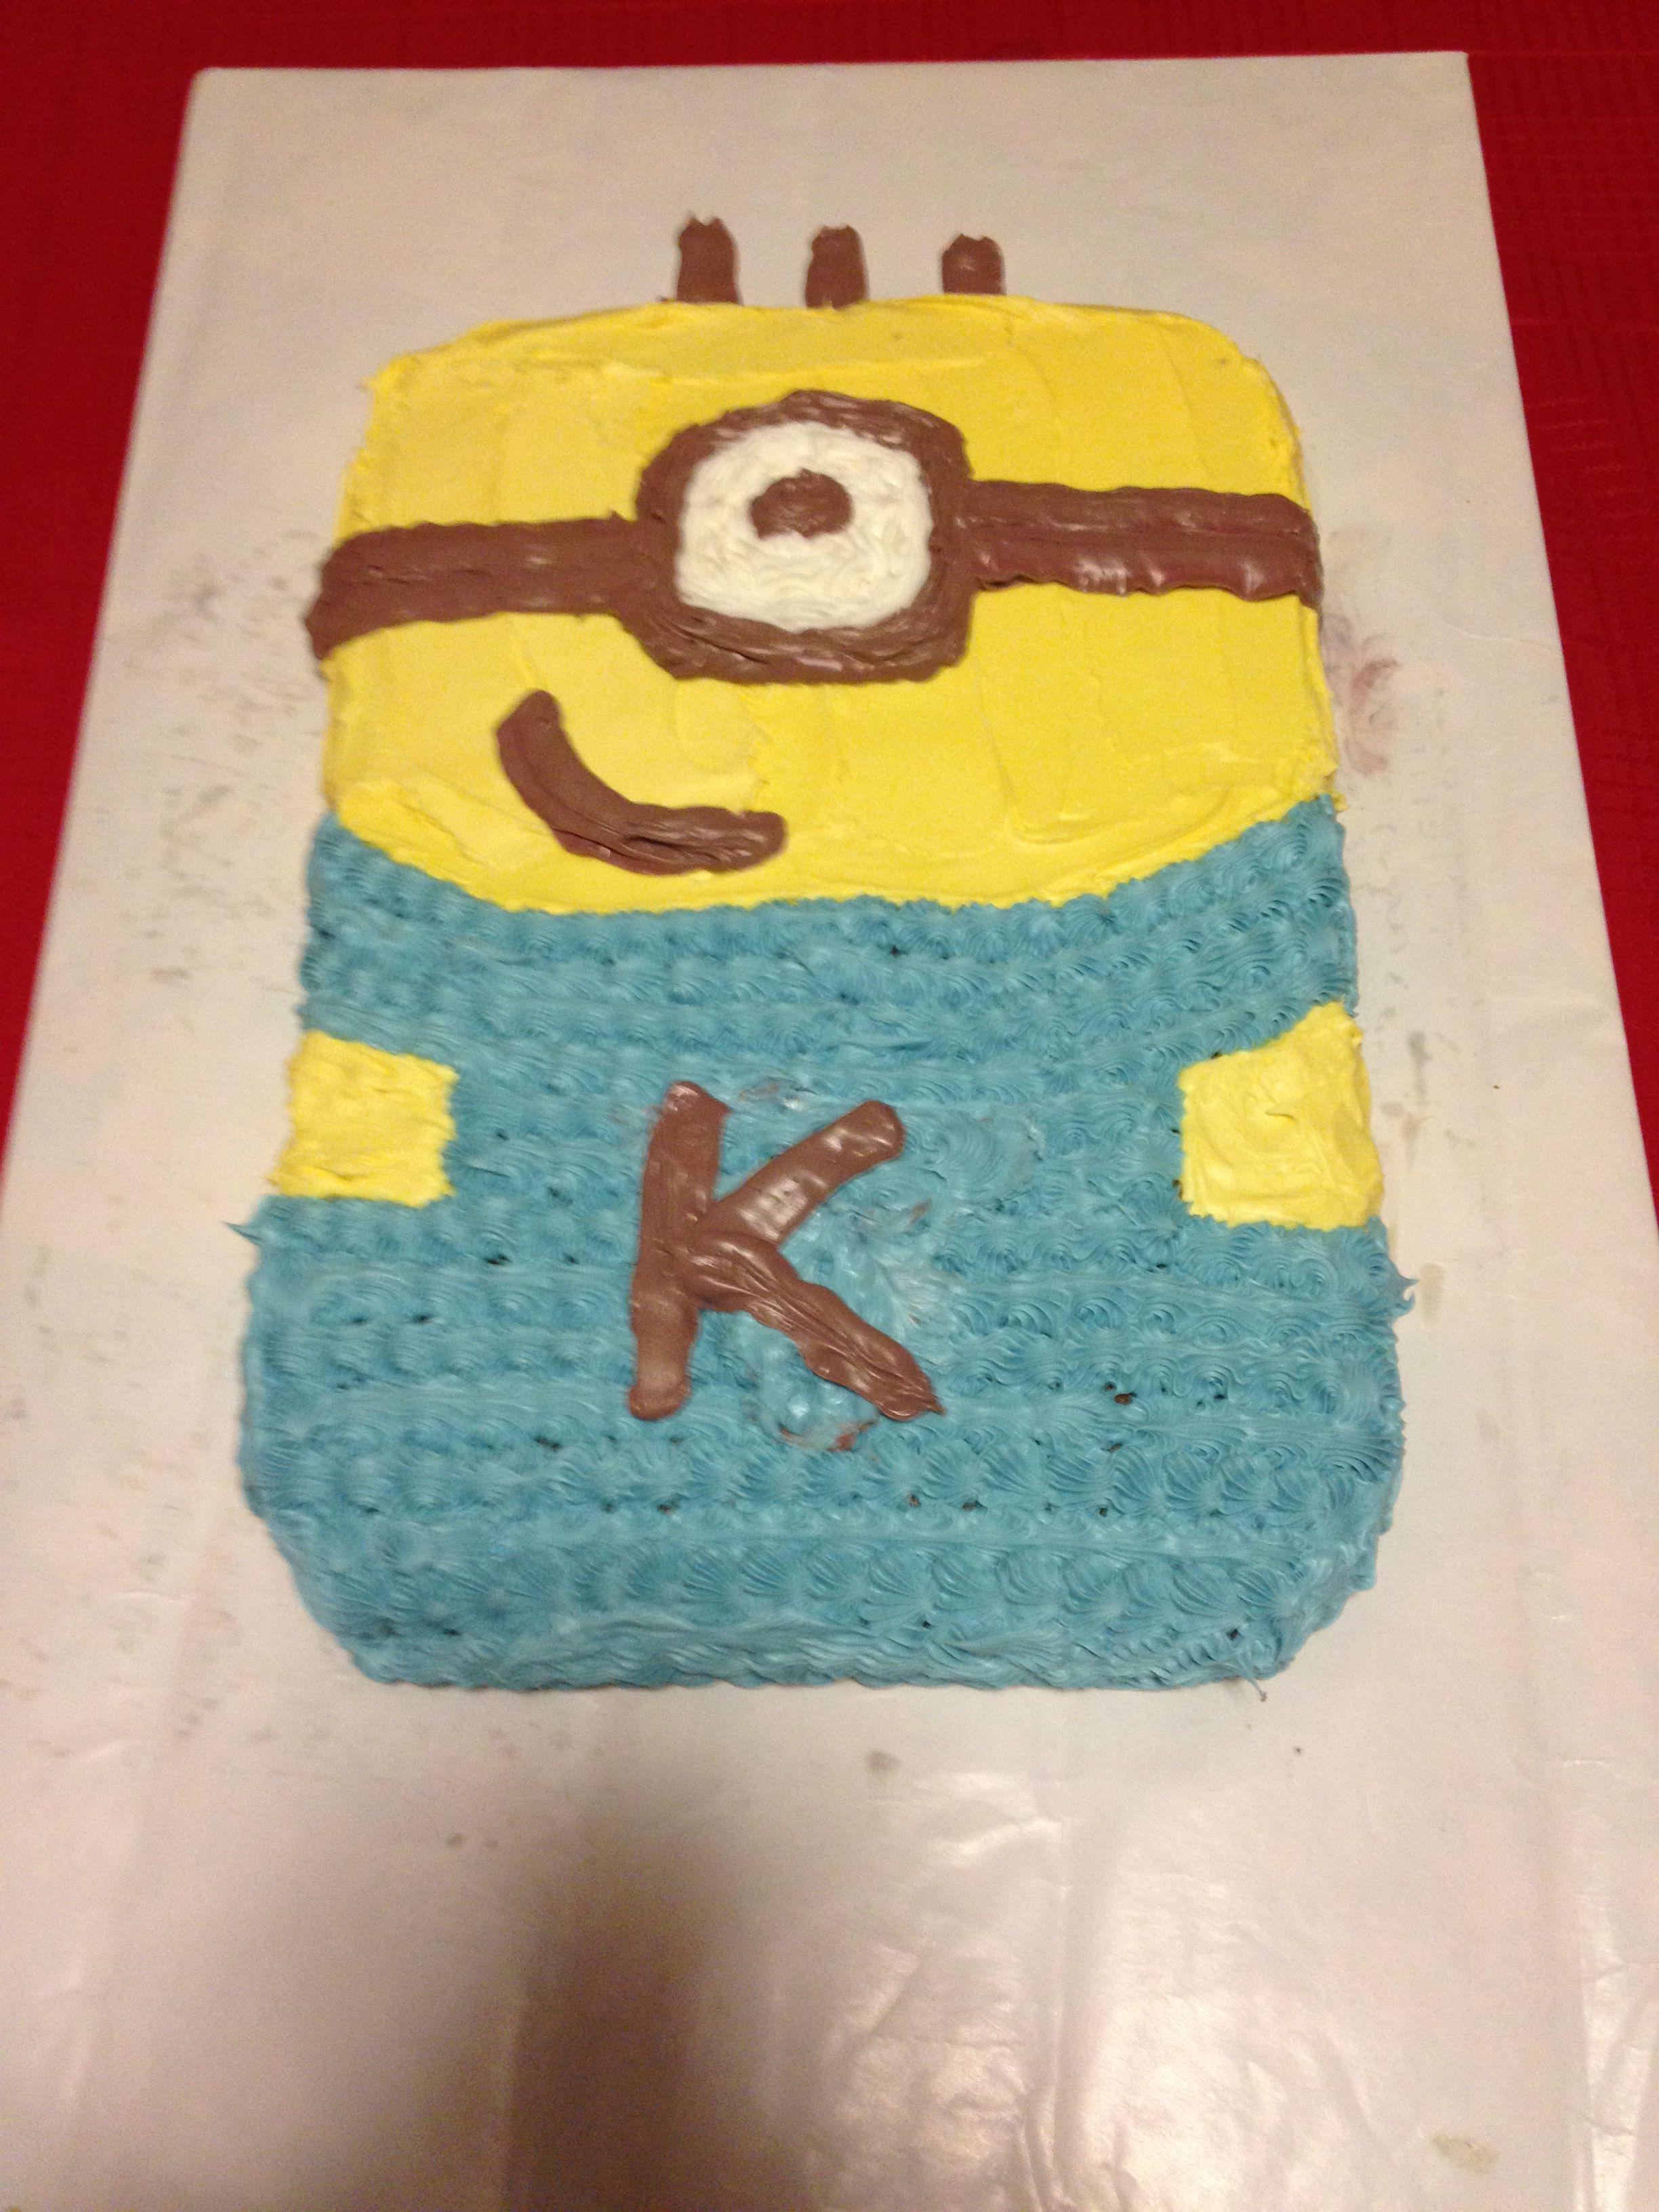 Kate's 8th Bday cake